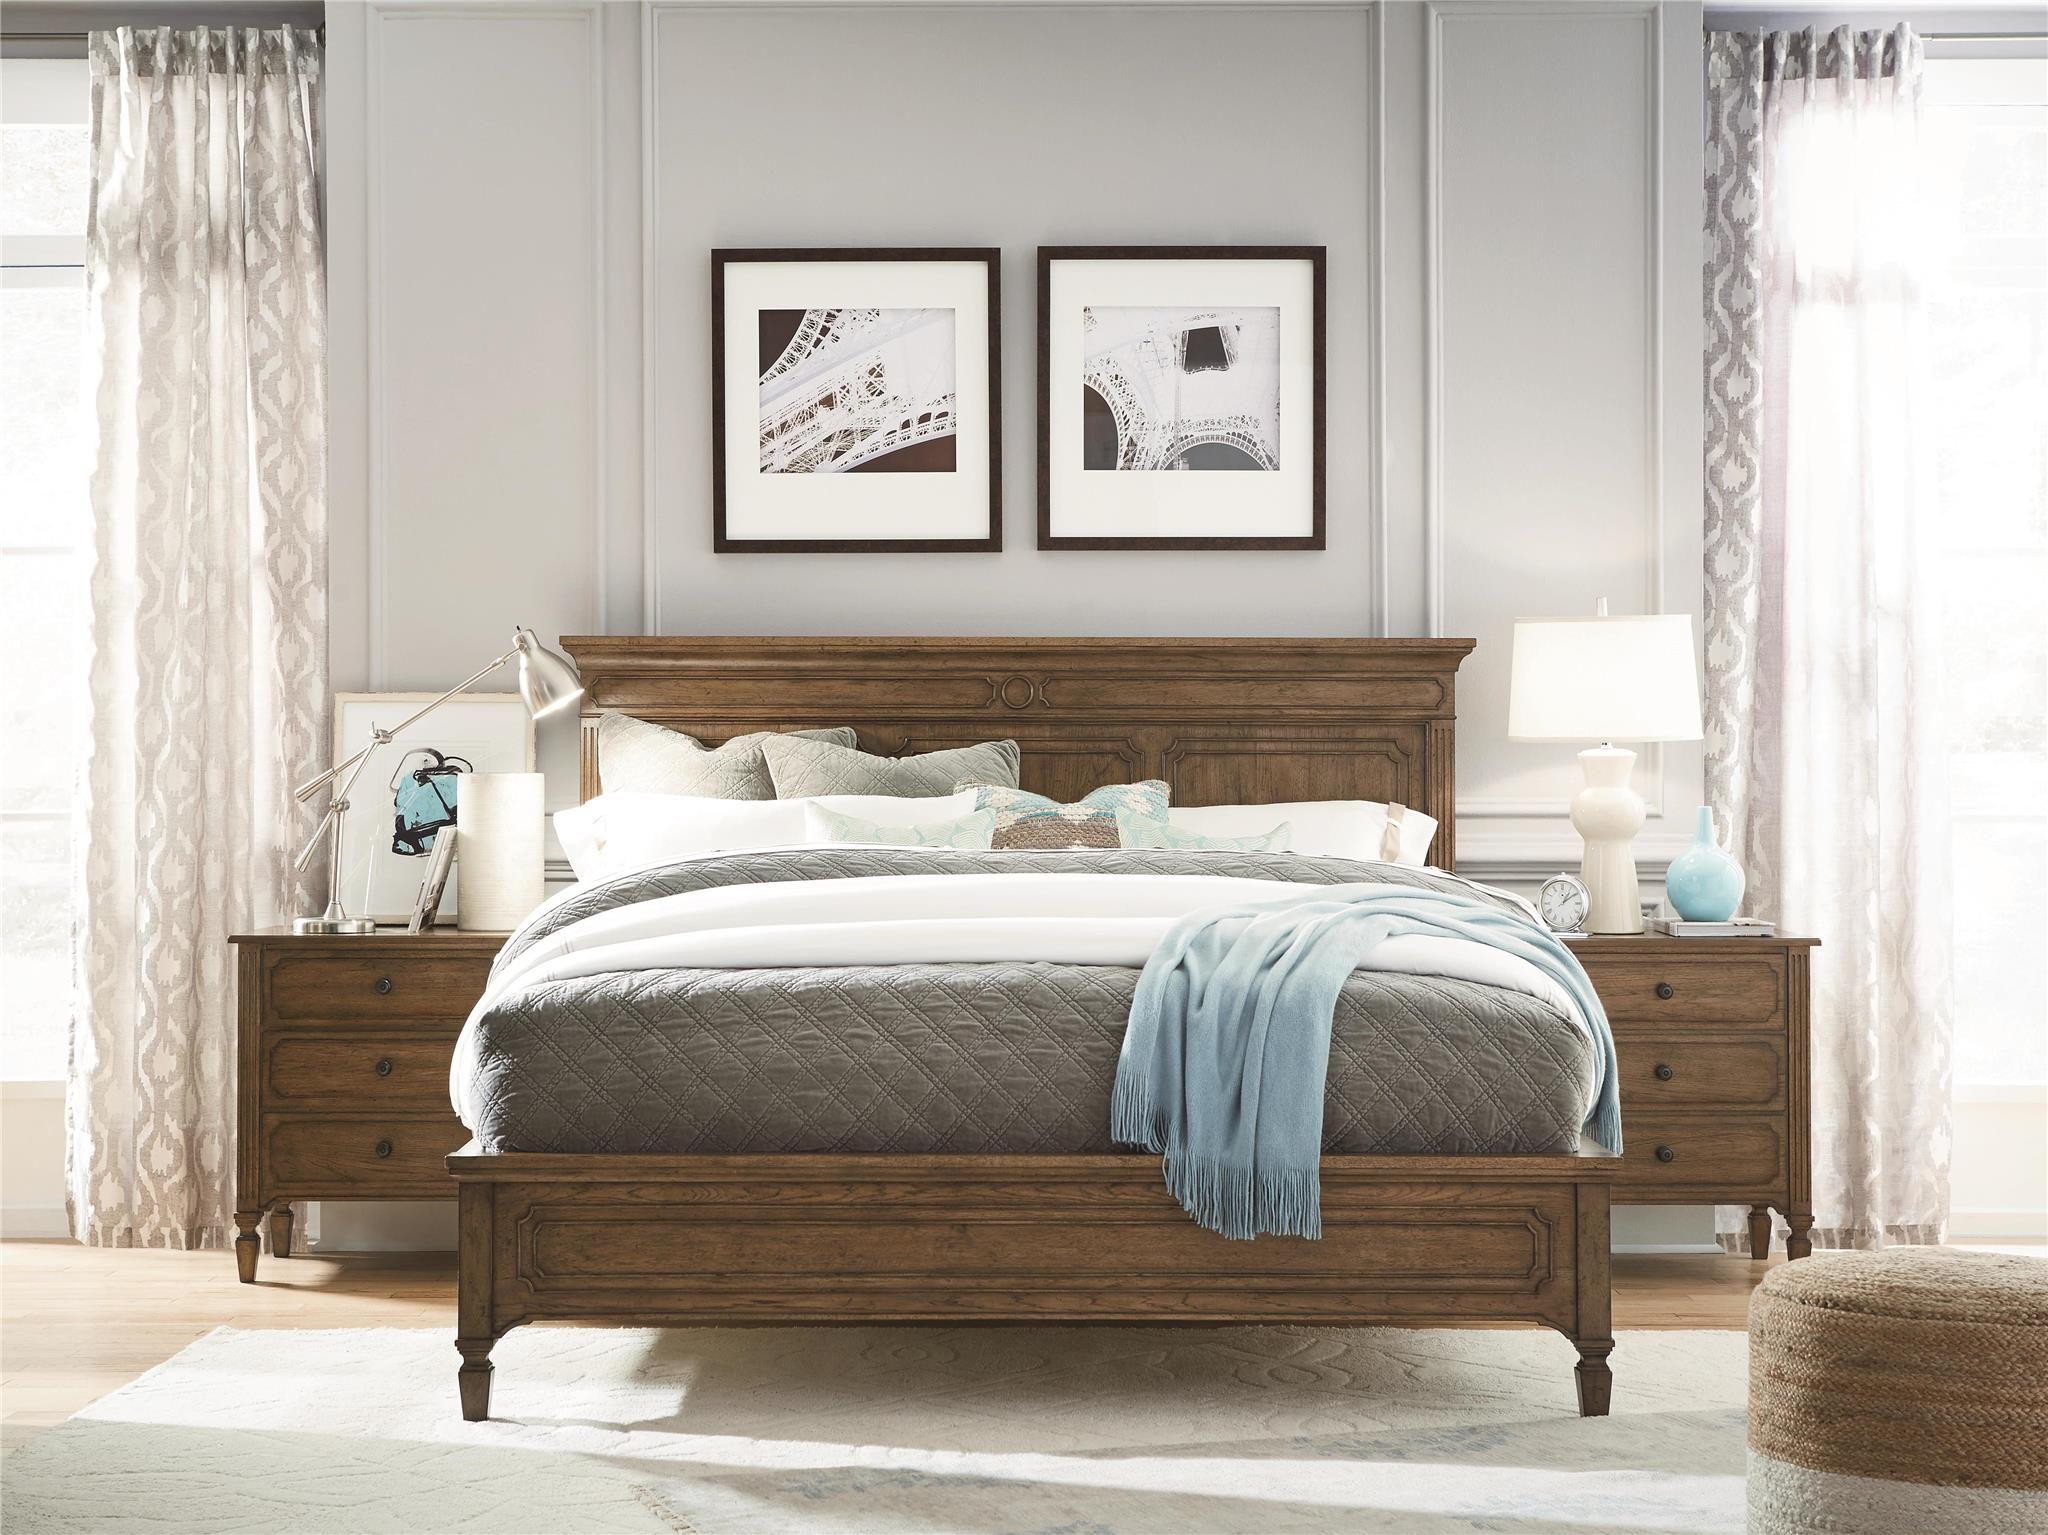 Universal furniture remix remix bed king remix pinterest